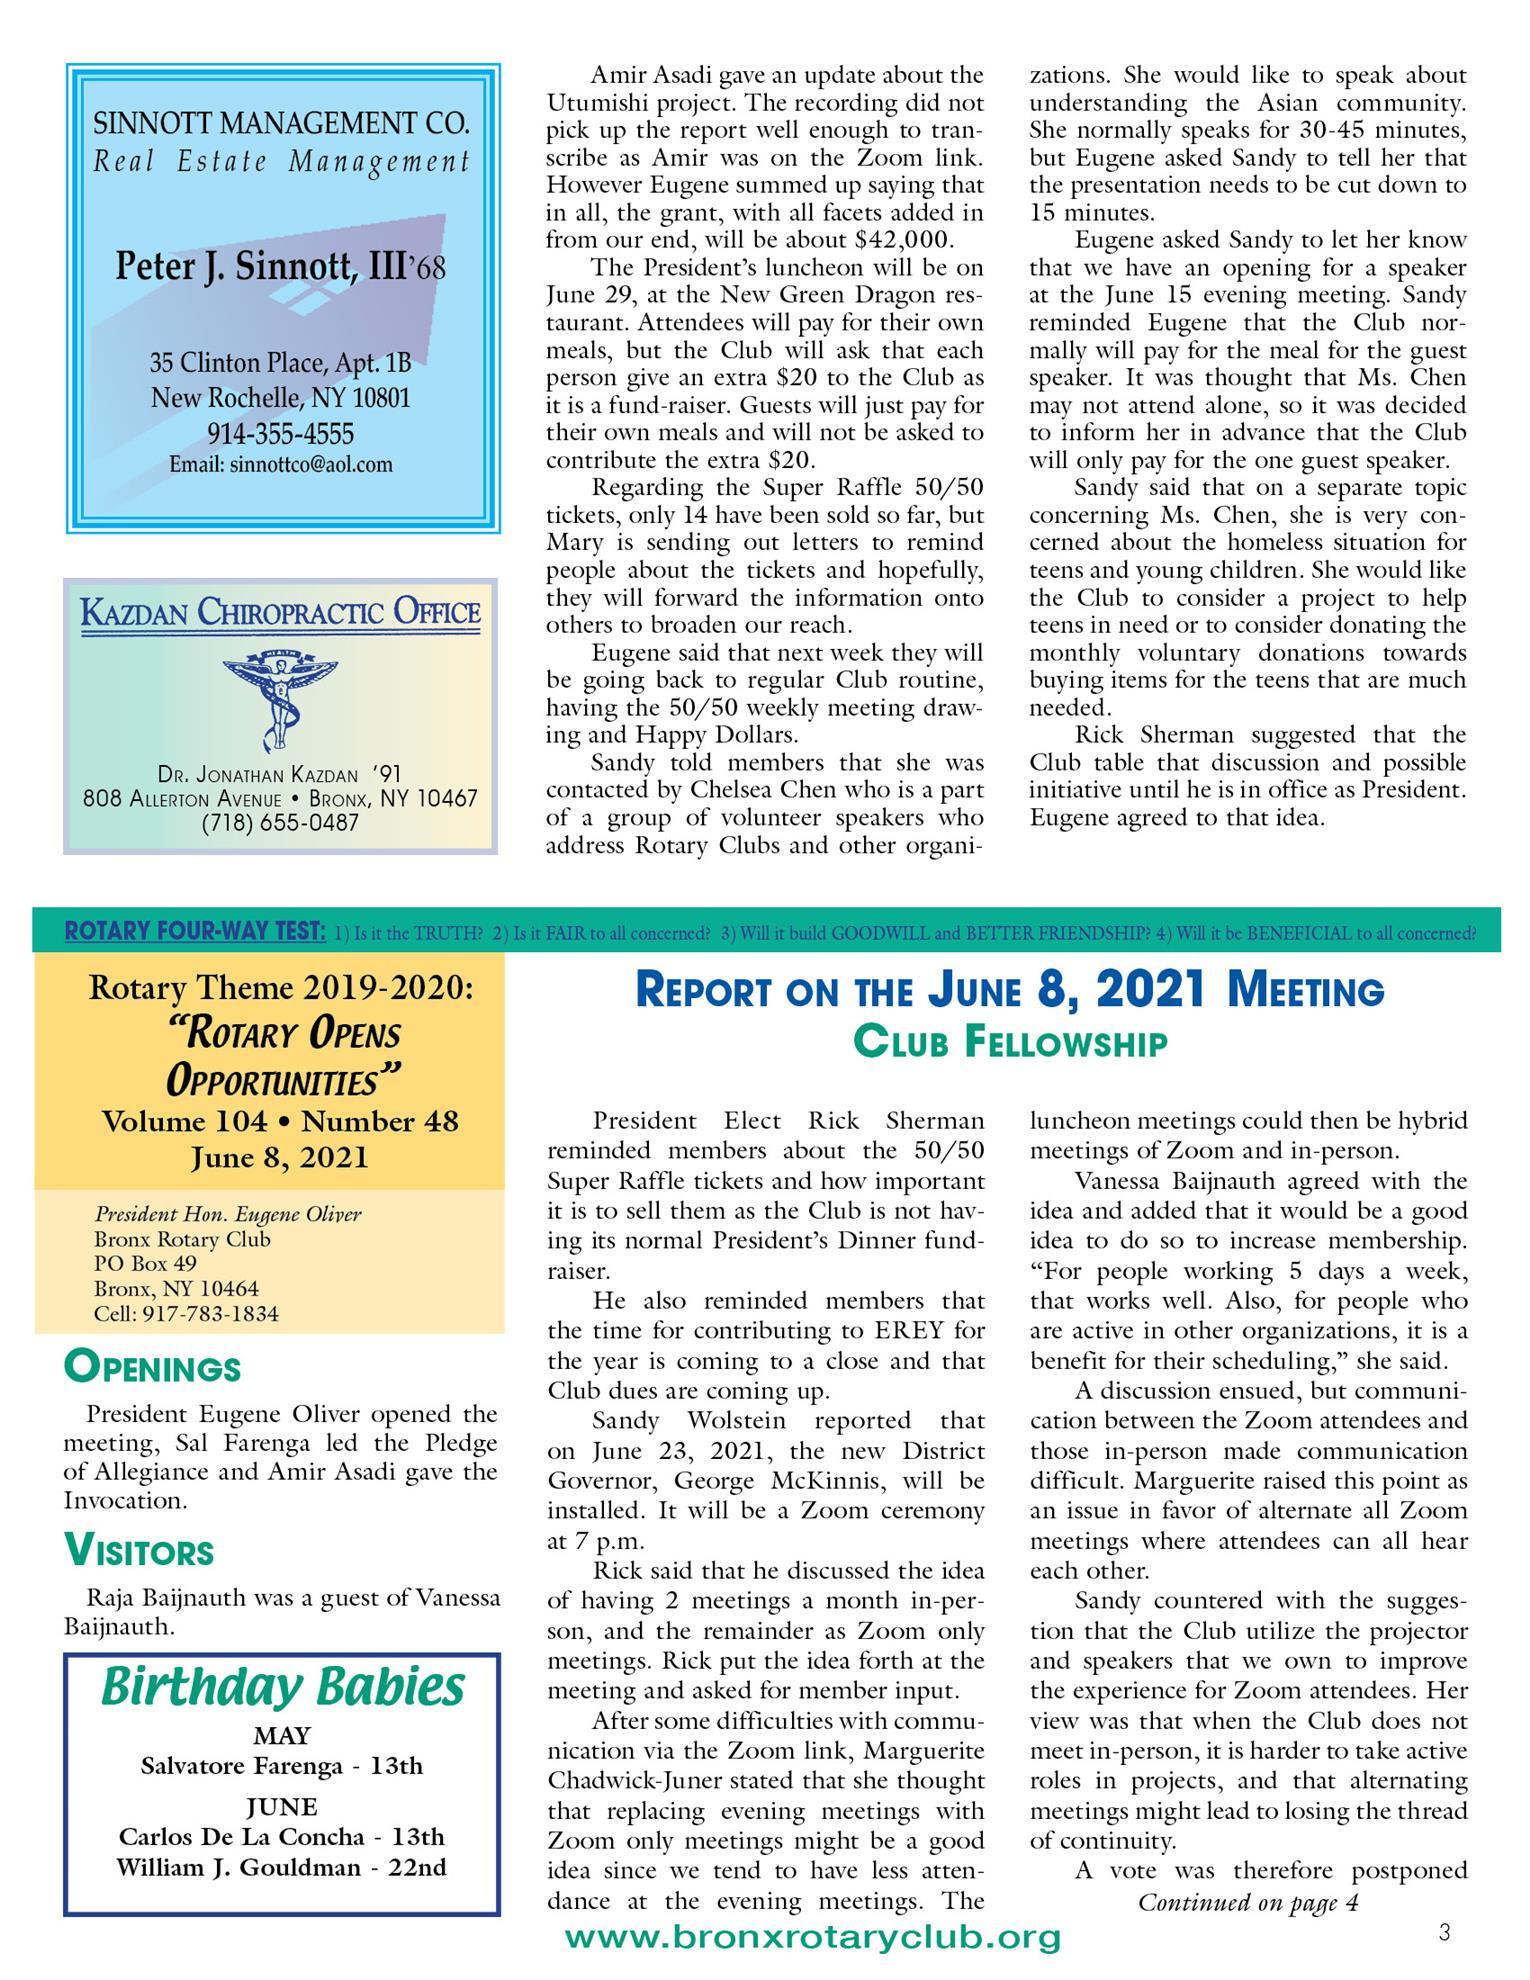 Tuesdays newsletter 5/25, 6/1 & 6/8 2021 p3